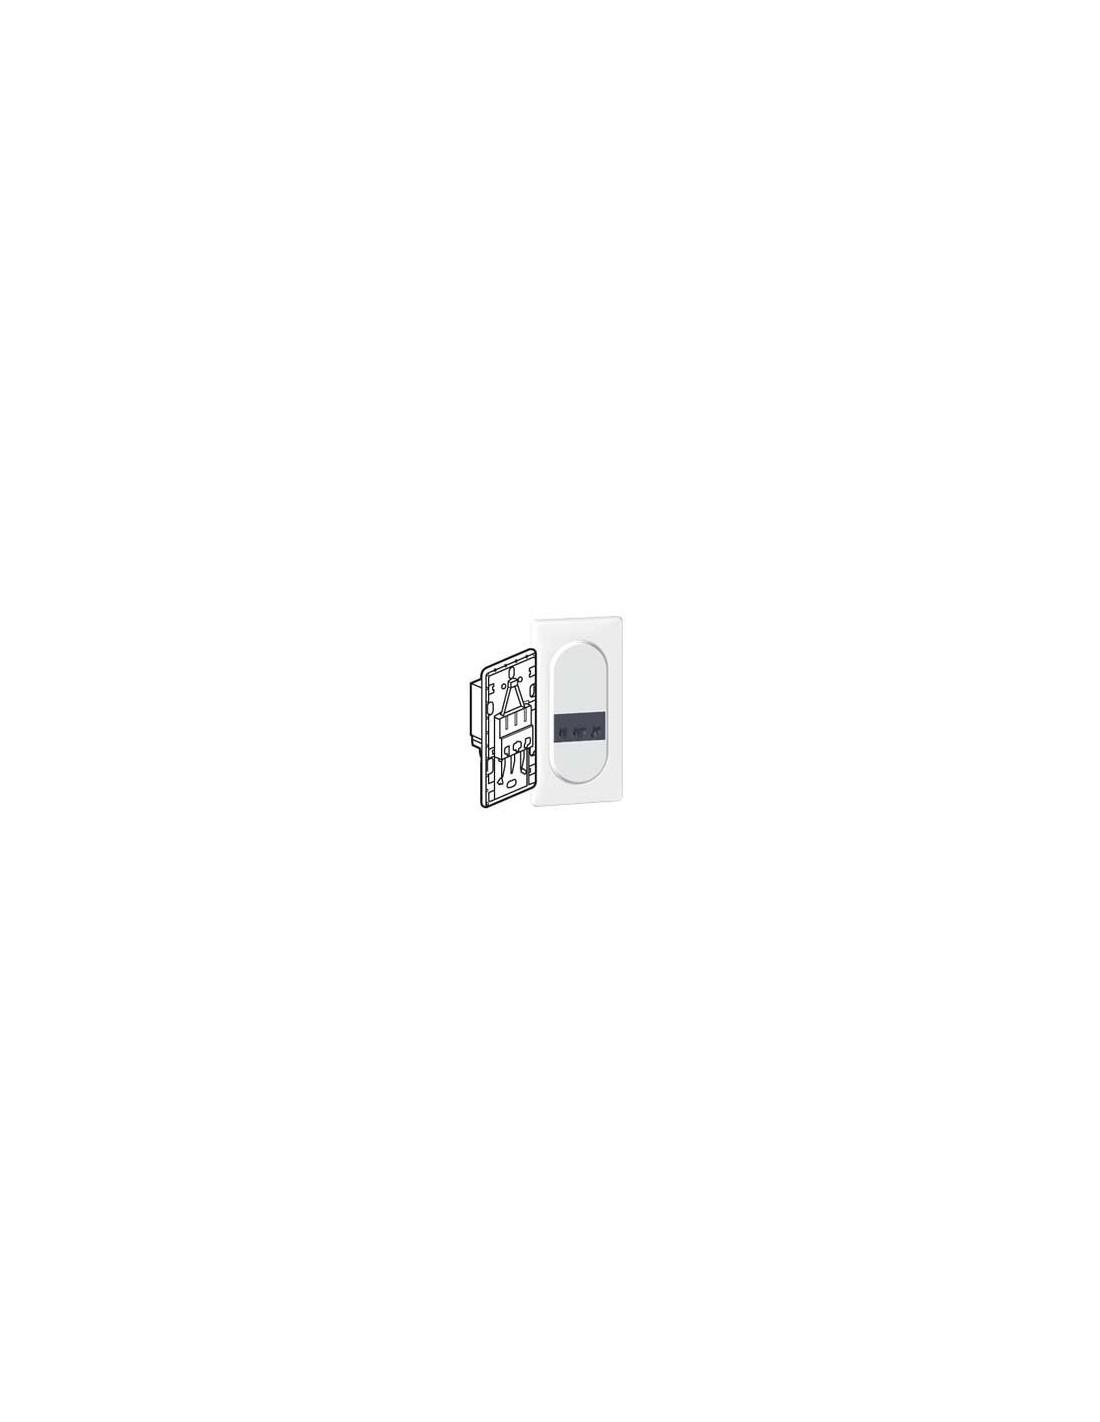 prise rasoir salle de bain c liane legrand avec plaque blanche prise rasoir salle de bain. Black Bedroom Furniture Sets. Home Design Ideas